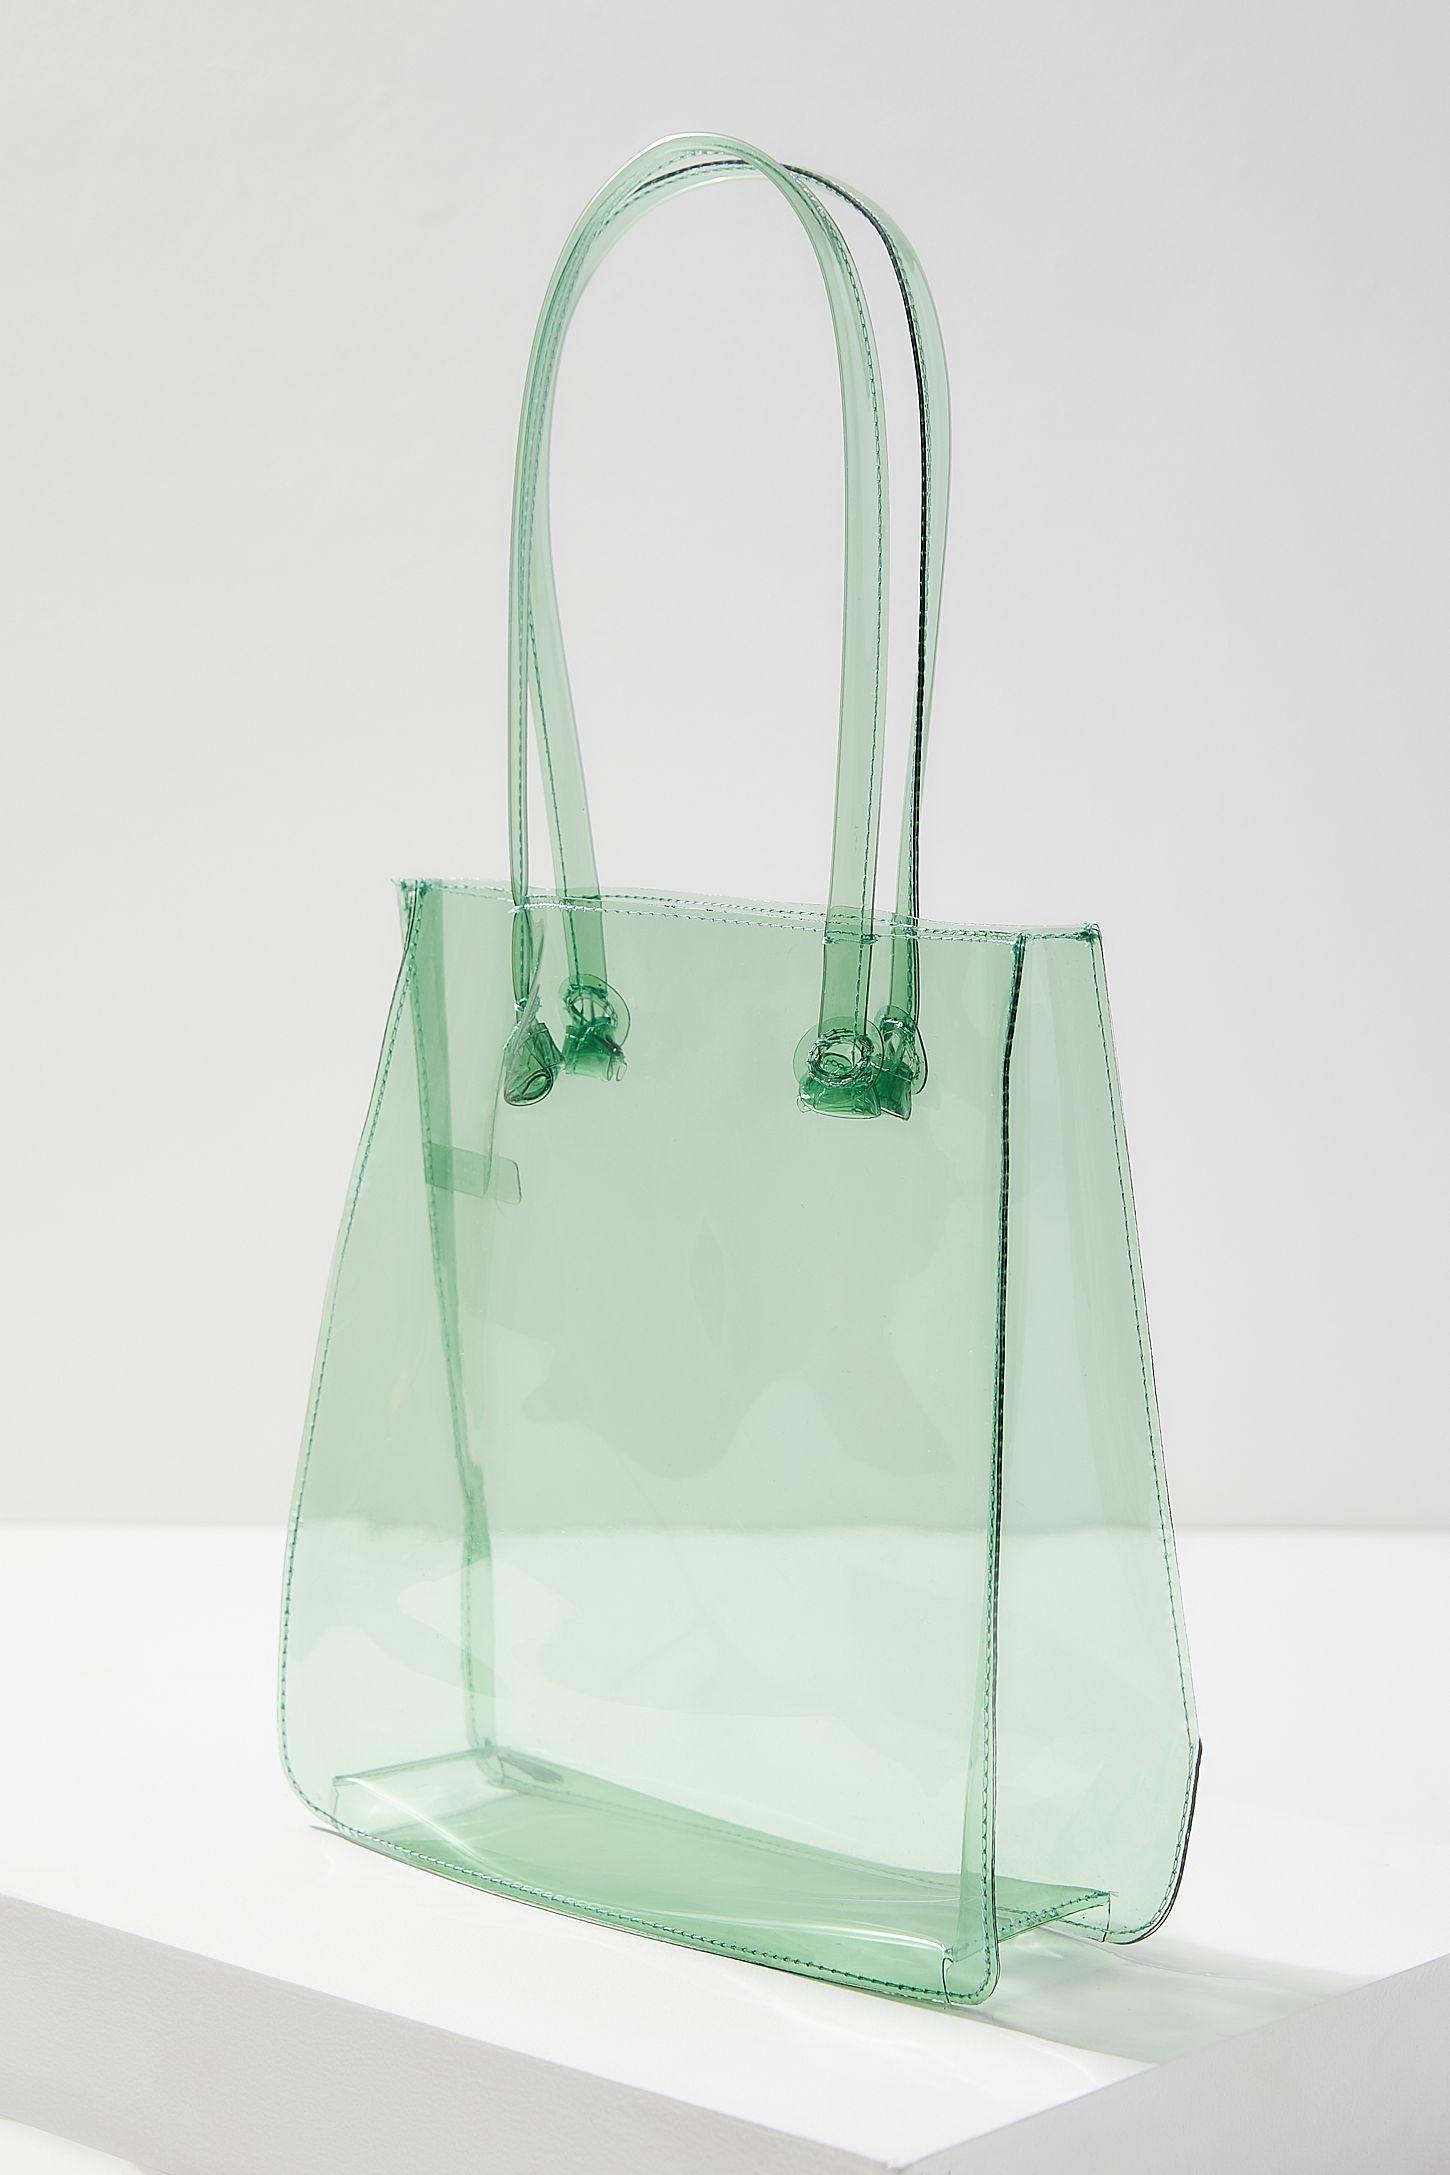 a5079e533f Slide View  3  Clear Mini Lady Tote Bag